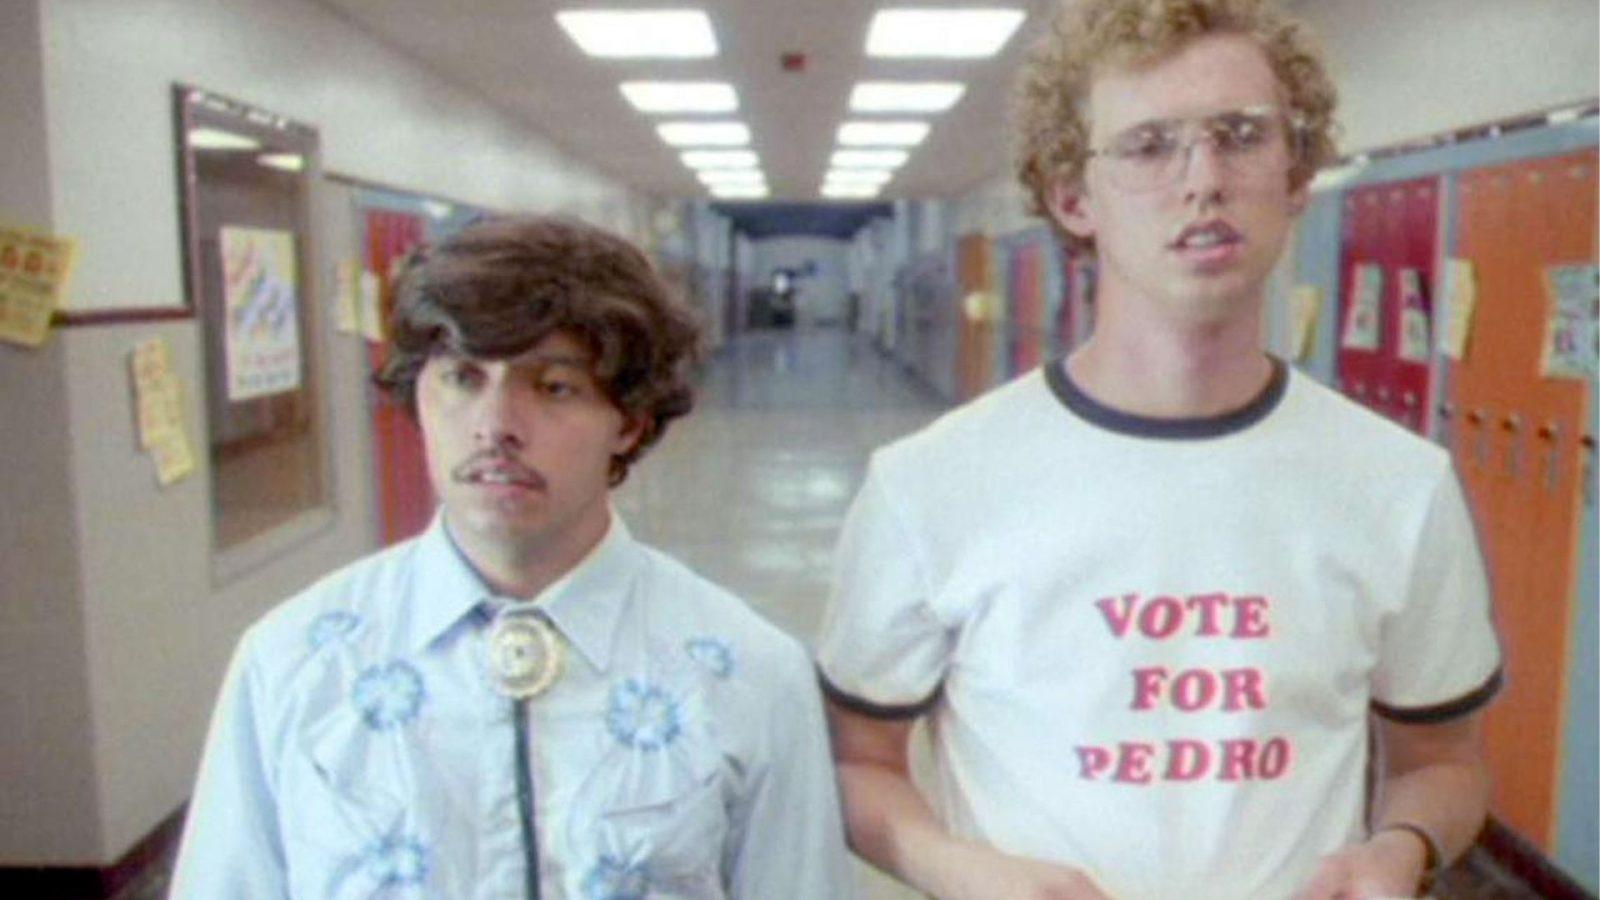 VUDU's $5 weekend sale features Napoleon Dynamite, Stargate, Annie, more